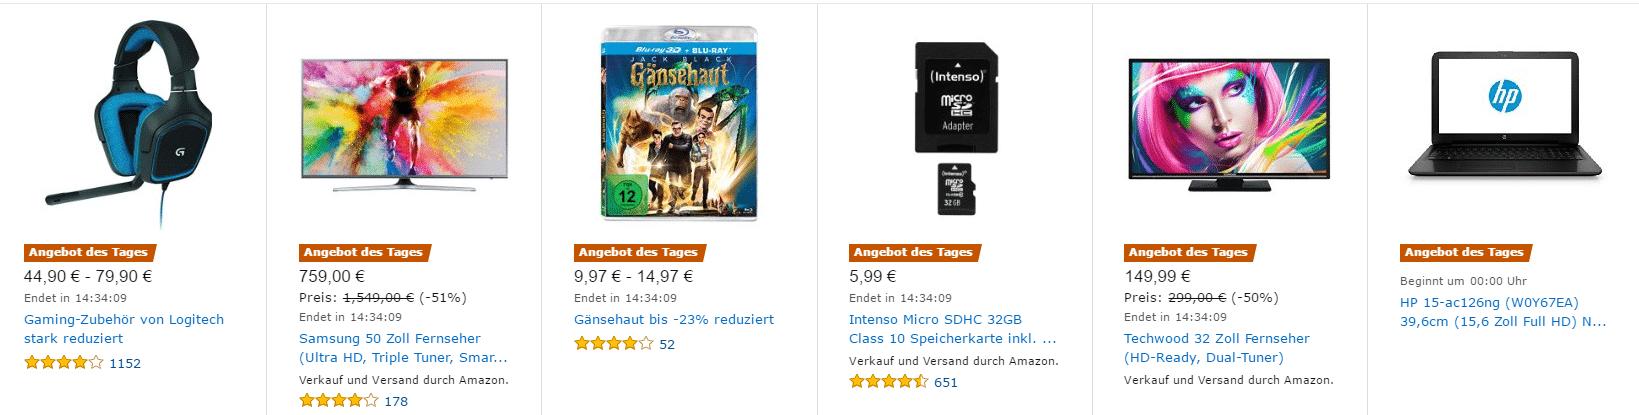 Amazon.de Angebote des Tages 21.06.2016 online kaufen (01 ...